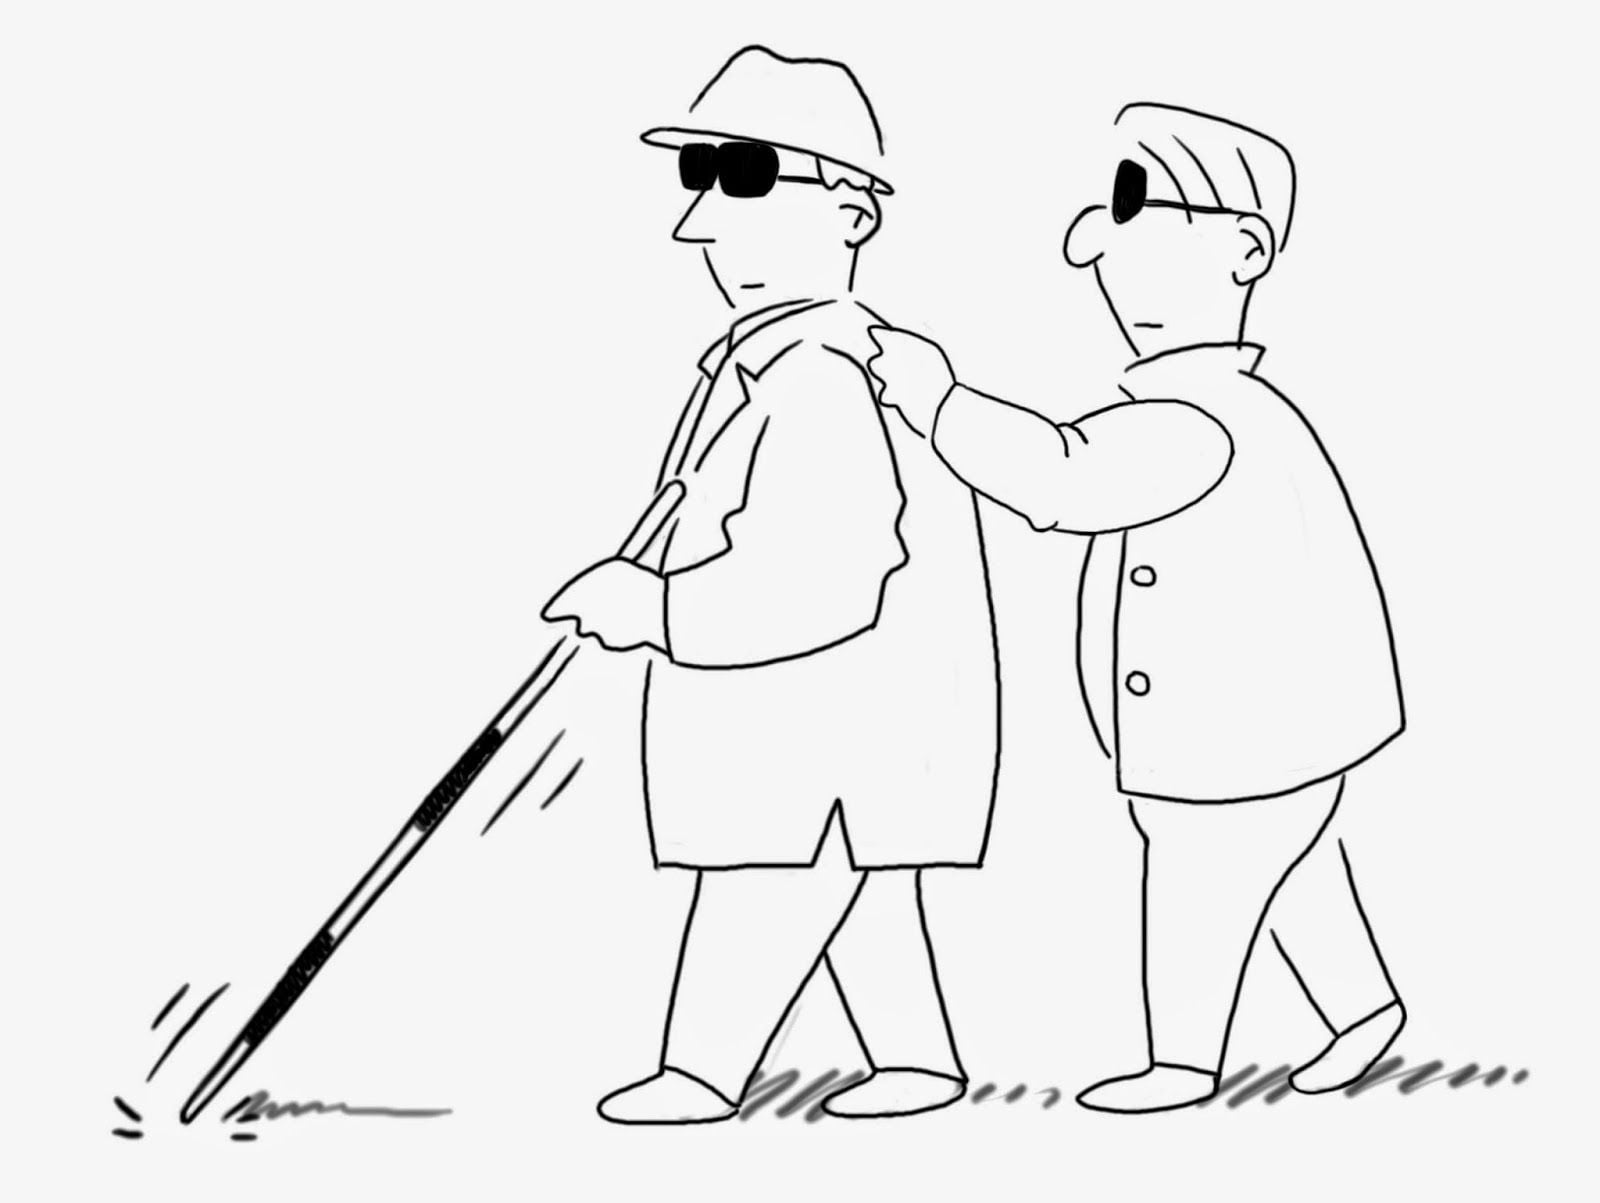 Irony example: blind leading the blind